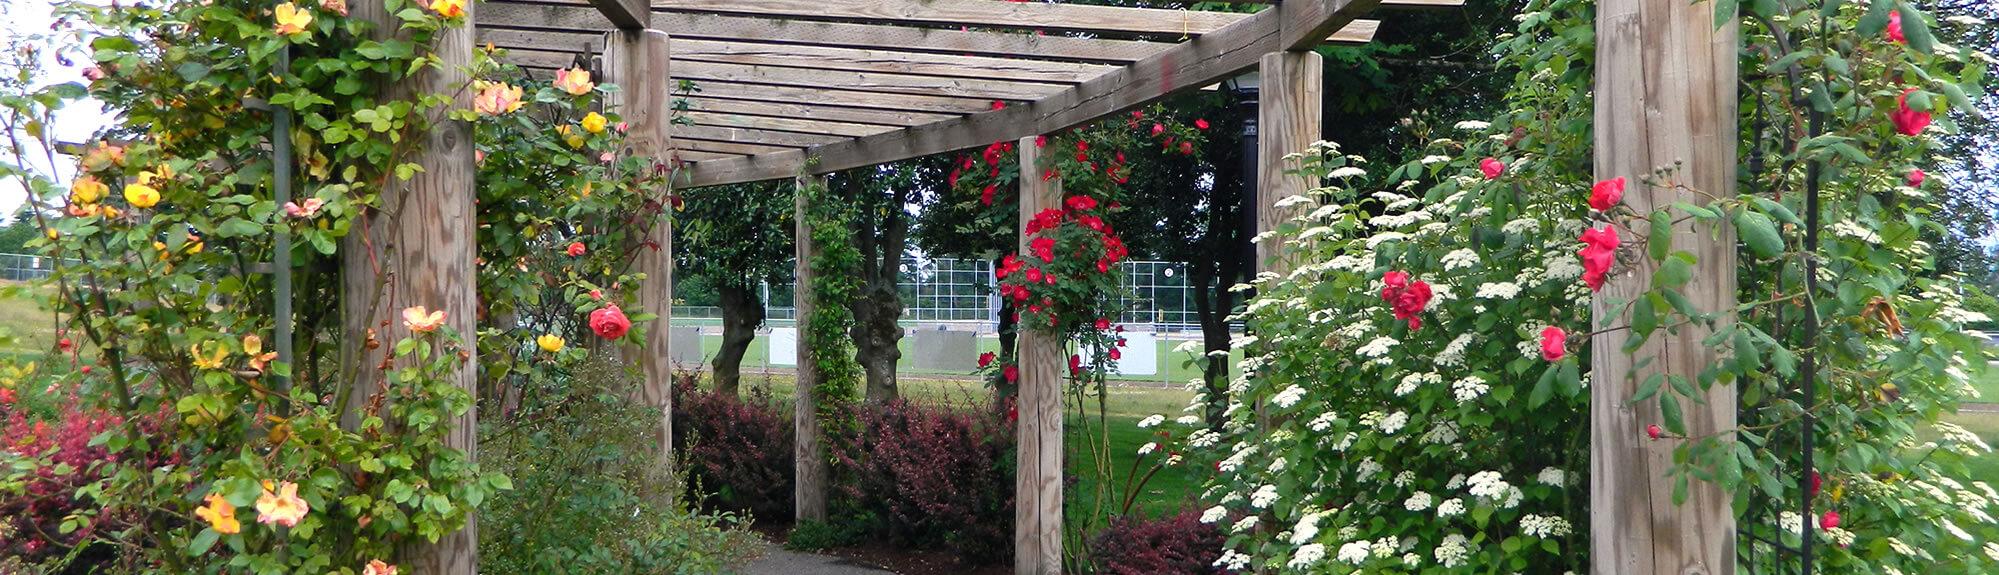 Activity Center - Mary's Rose Garden